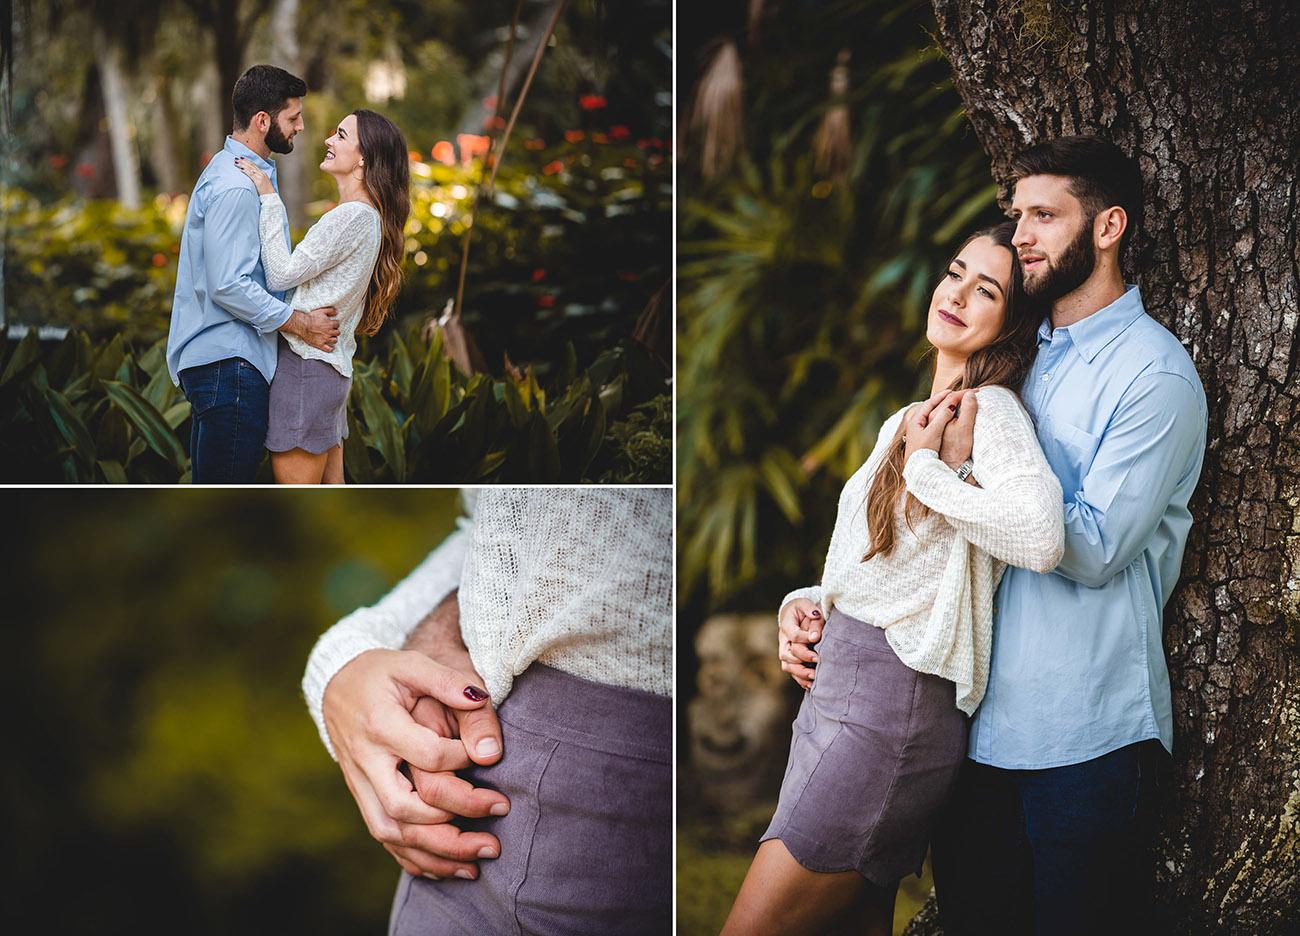 adam-szarmack-jacksonville-wedding-photographer-palm-coast-washing-oaks-garden-state-park-engagement-29.jpg